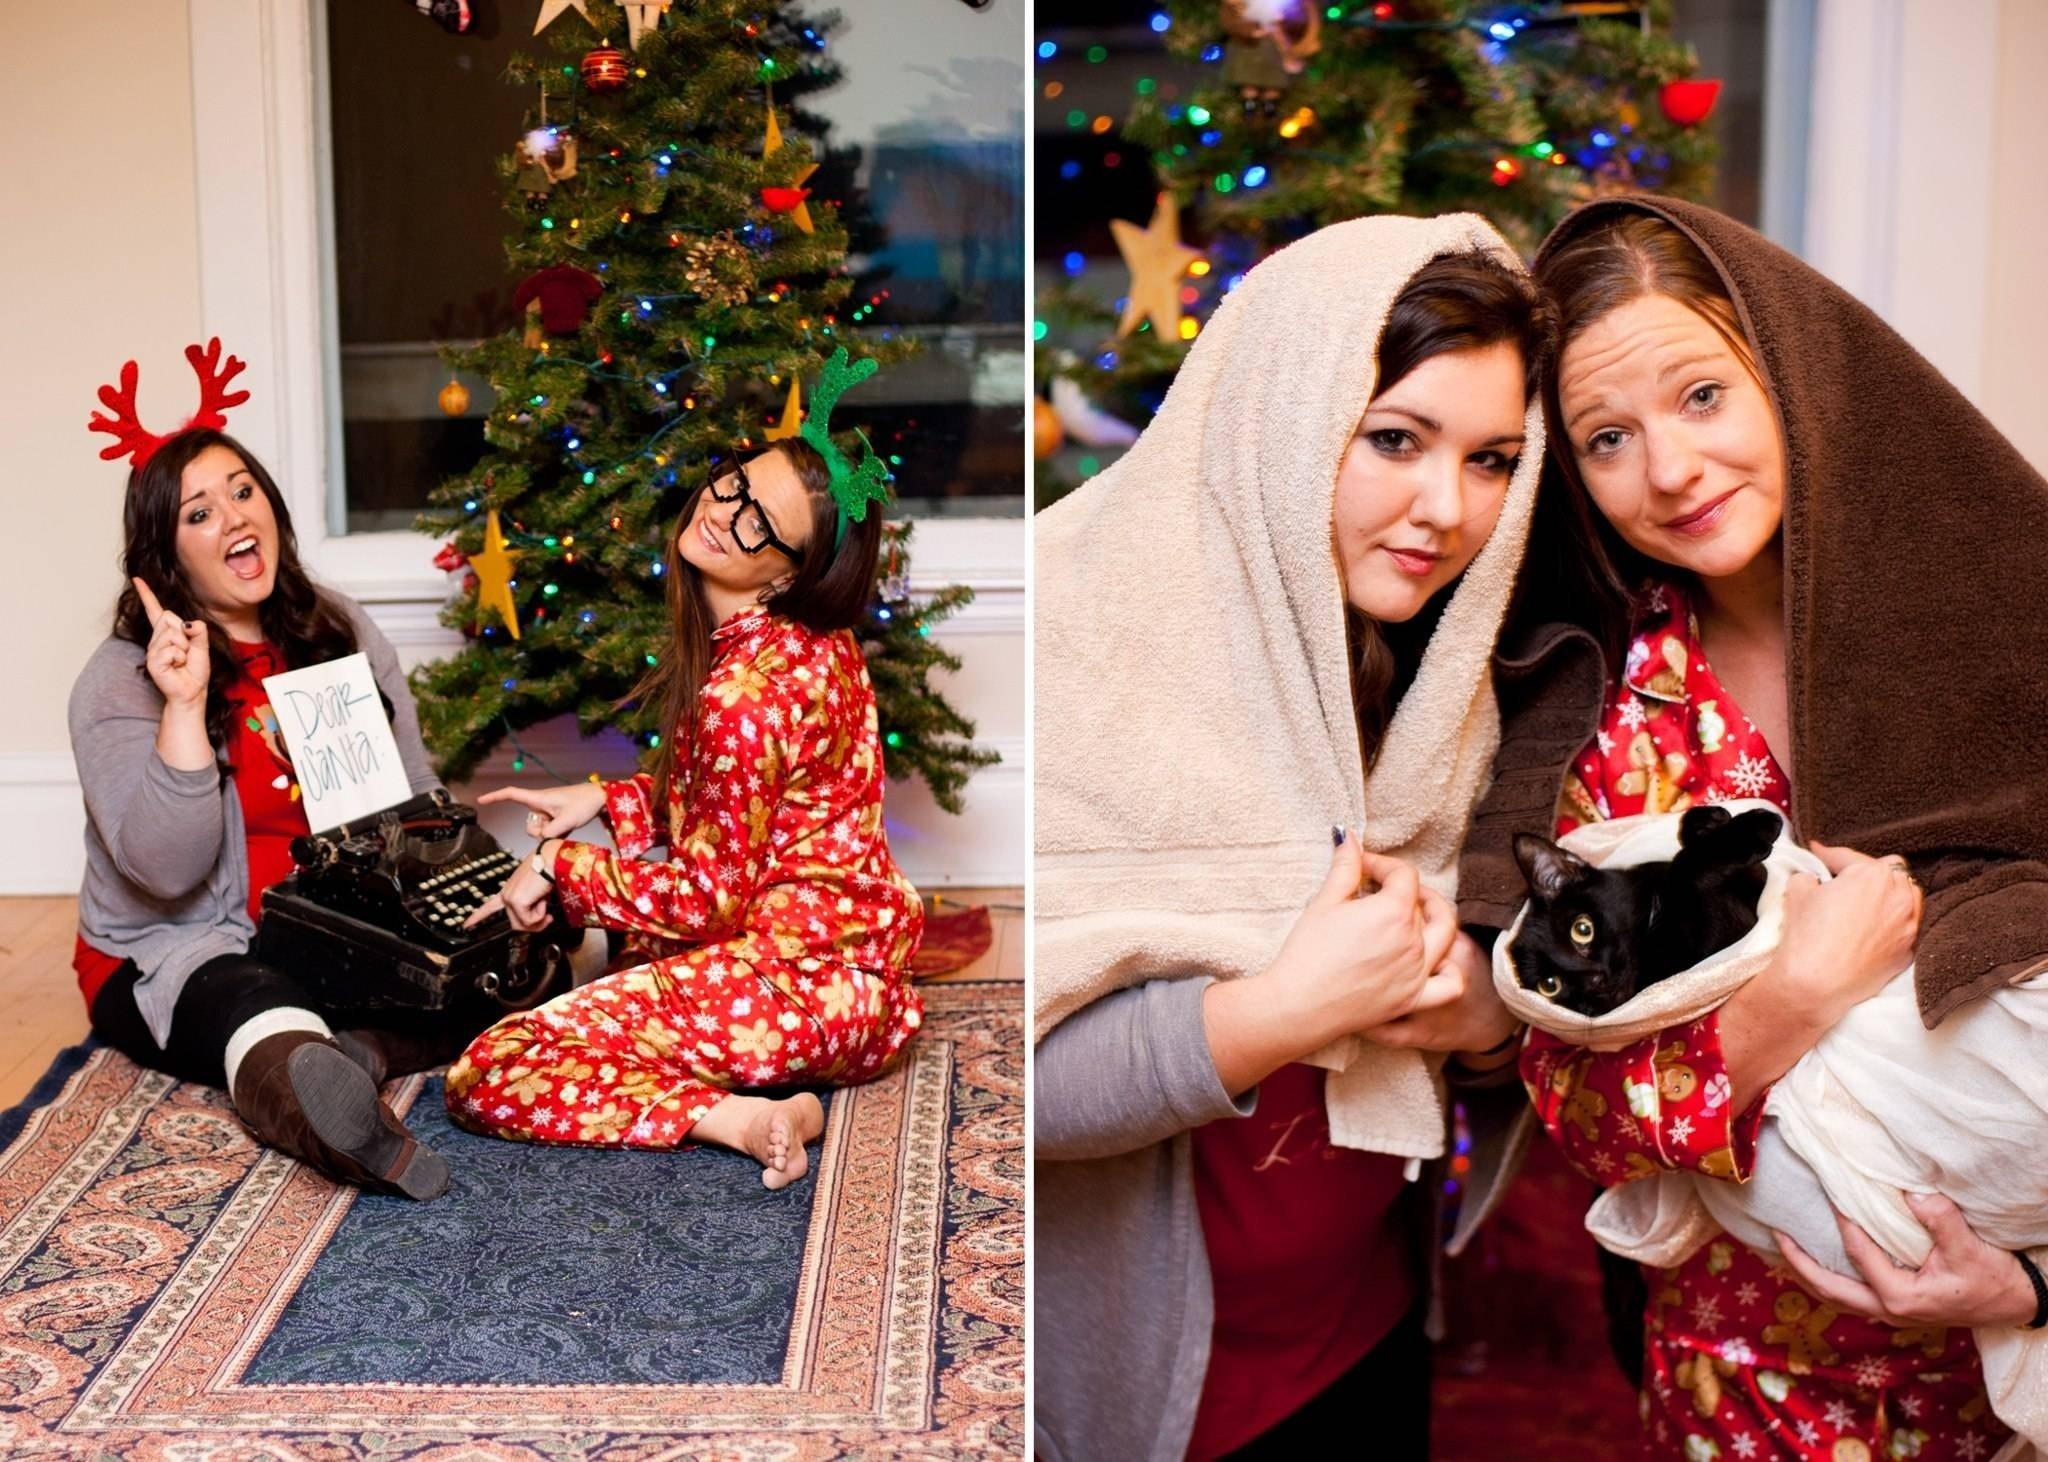 10 Fashionable Christmas Card Ideas For Couples funny homemade christmas cards huffington post tierra este 17145 1 2021